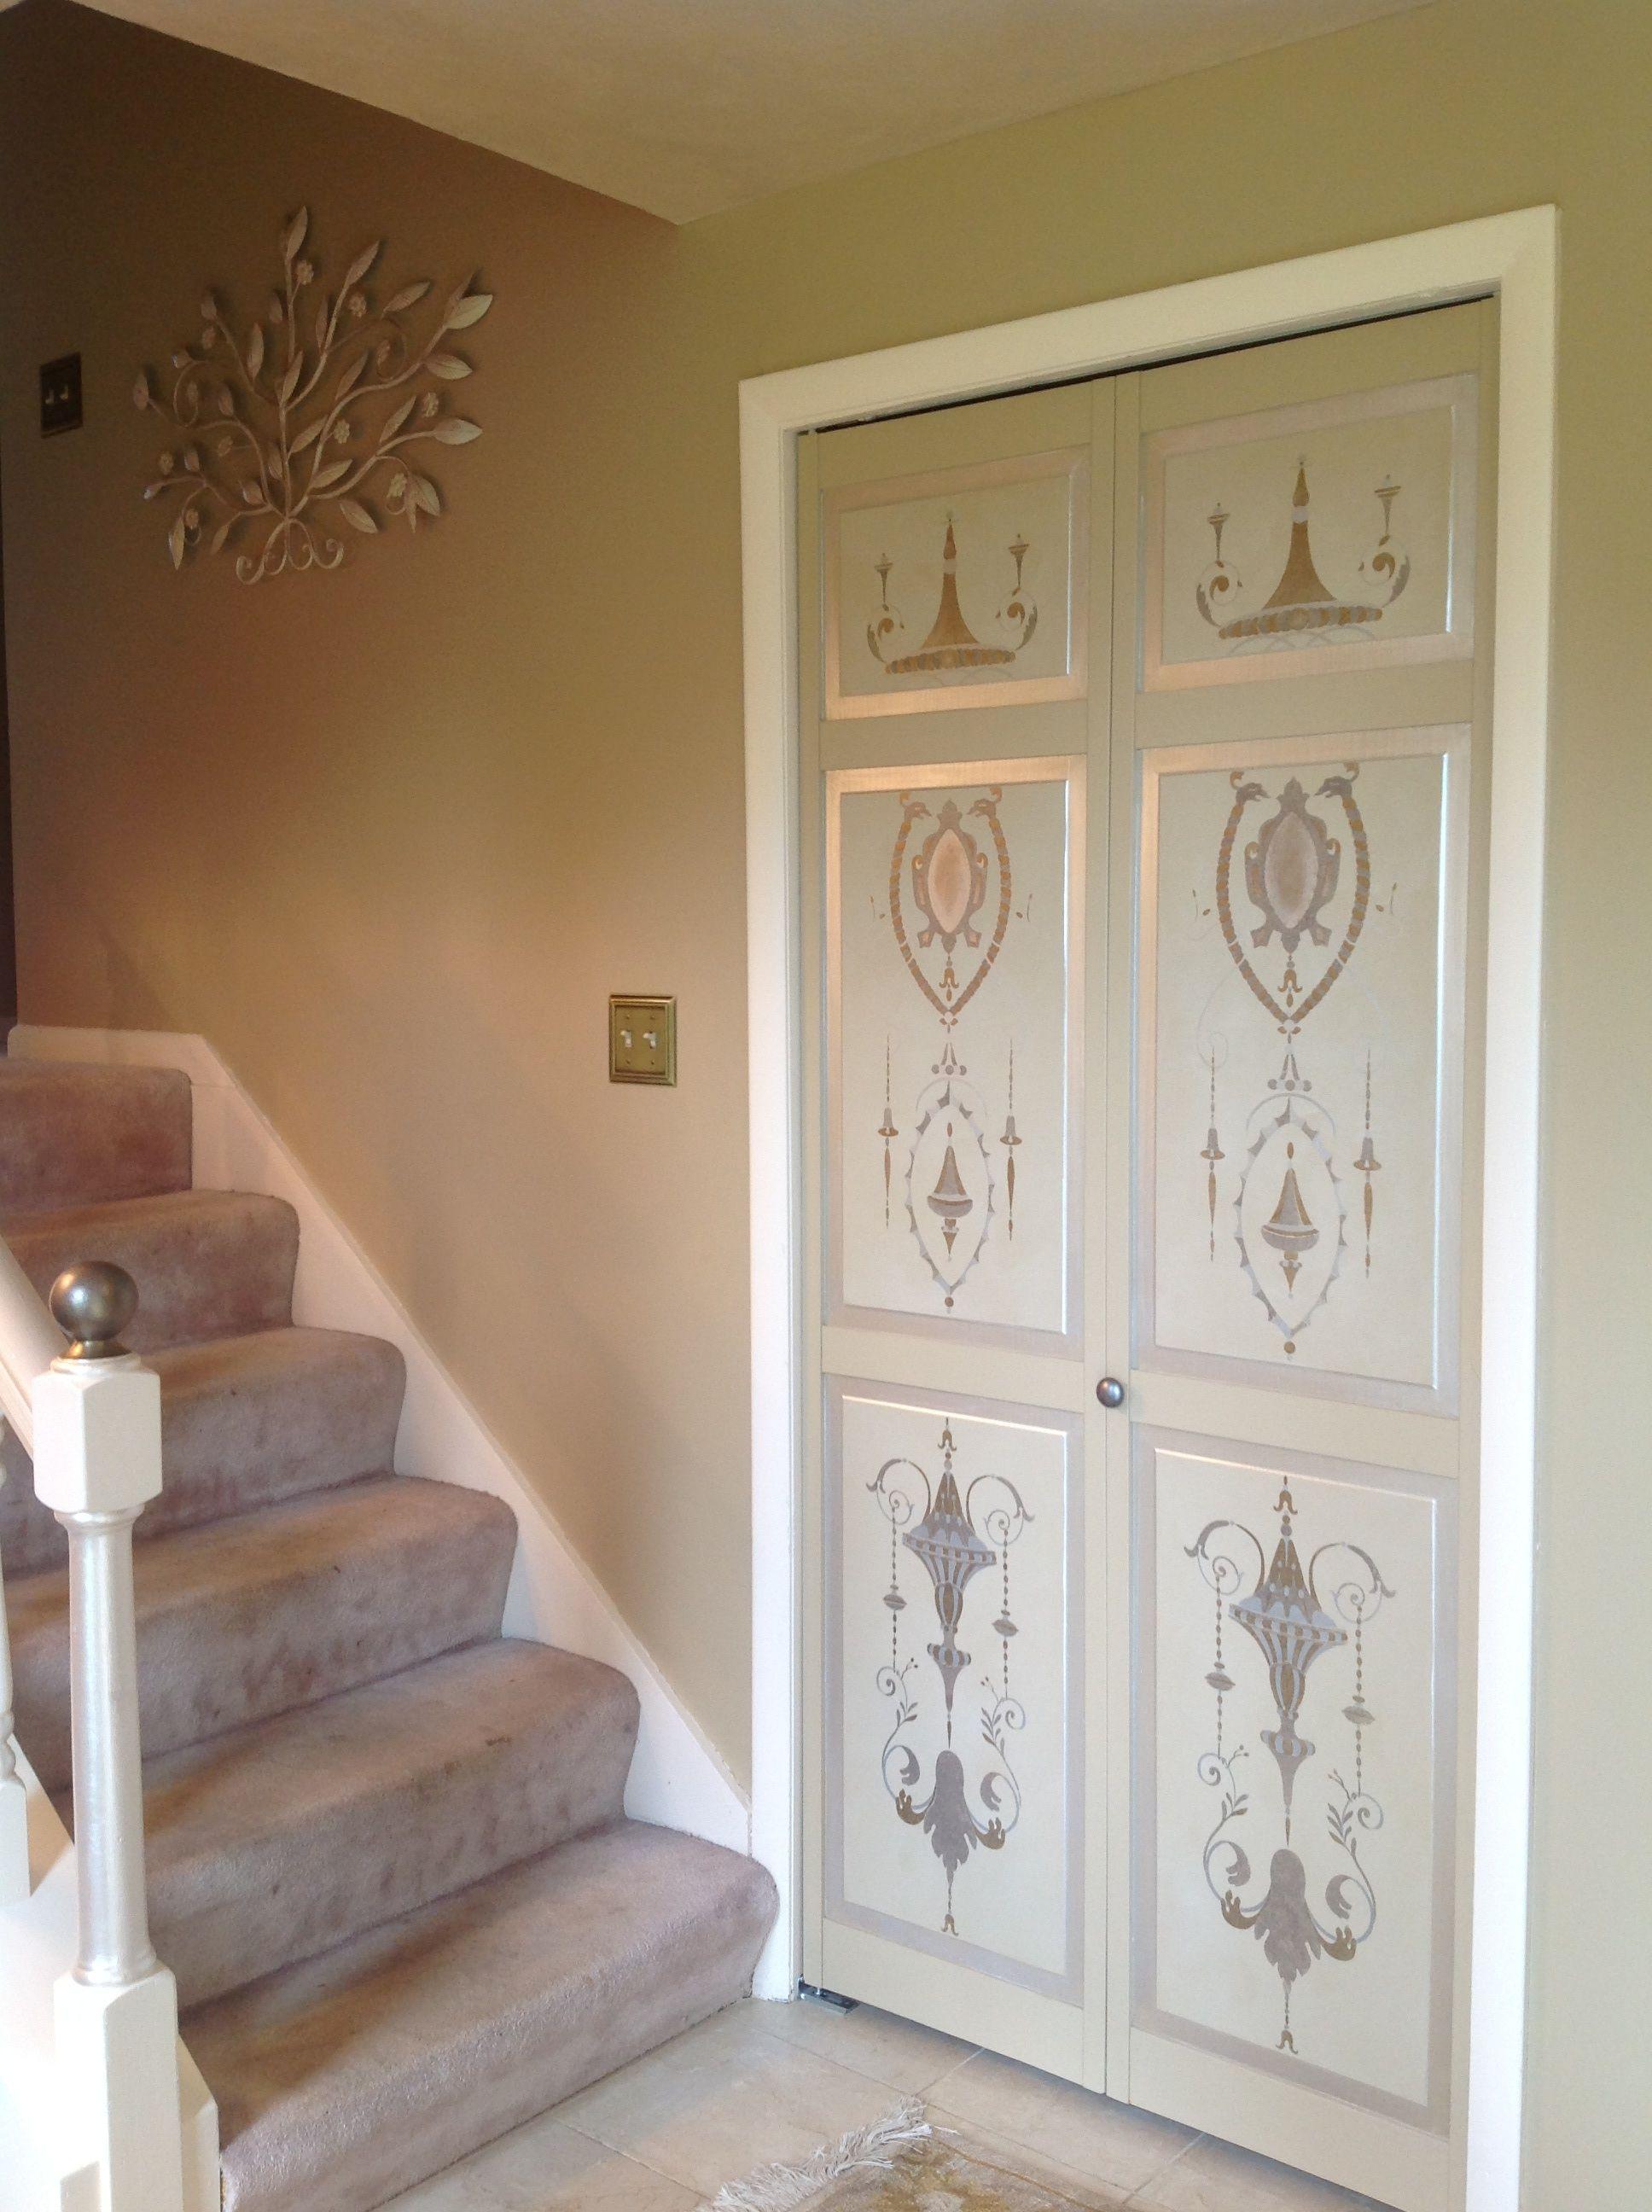 Ornamental Coat Closet Doors In A Foyer By Decorative Artist Heather Bruno Sears Home Decor Decor Furniture